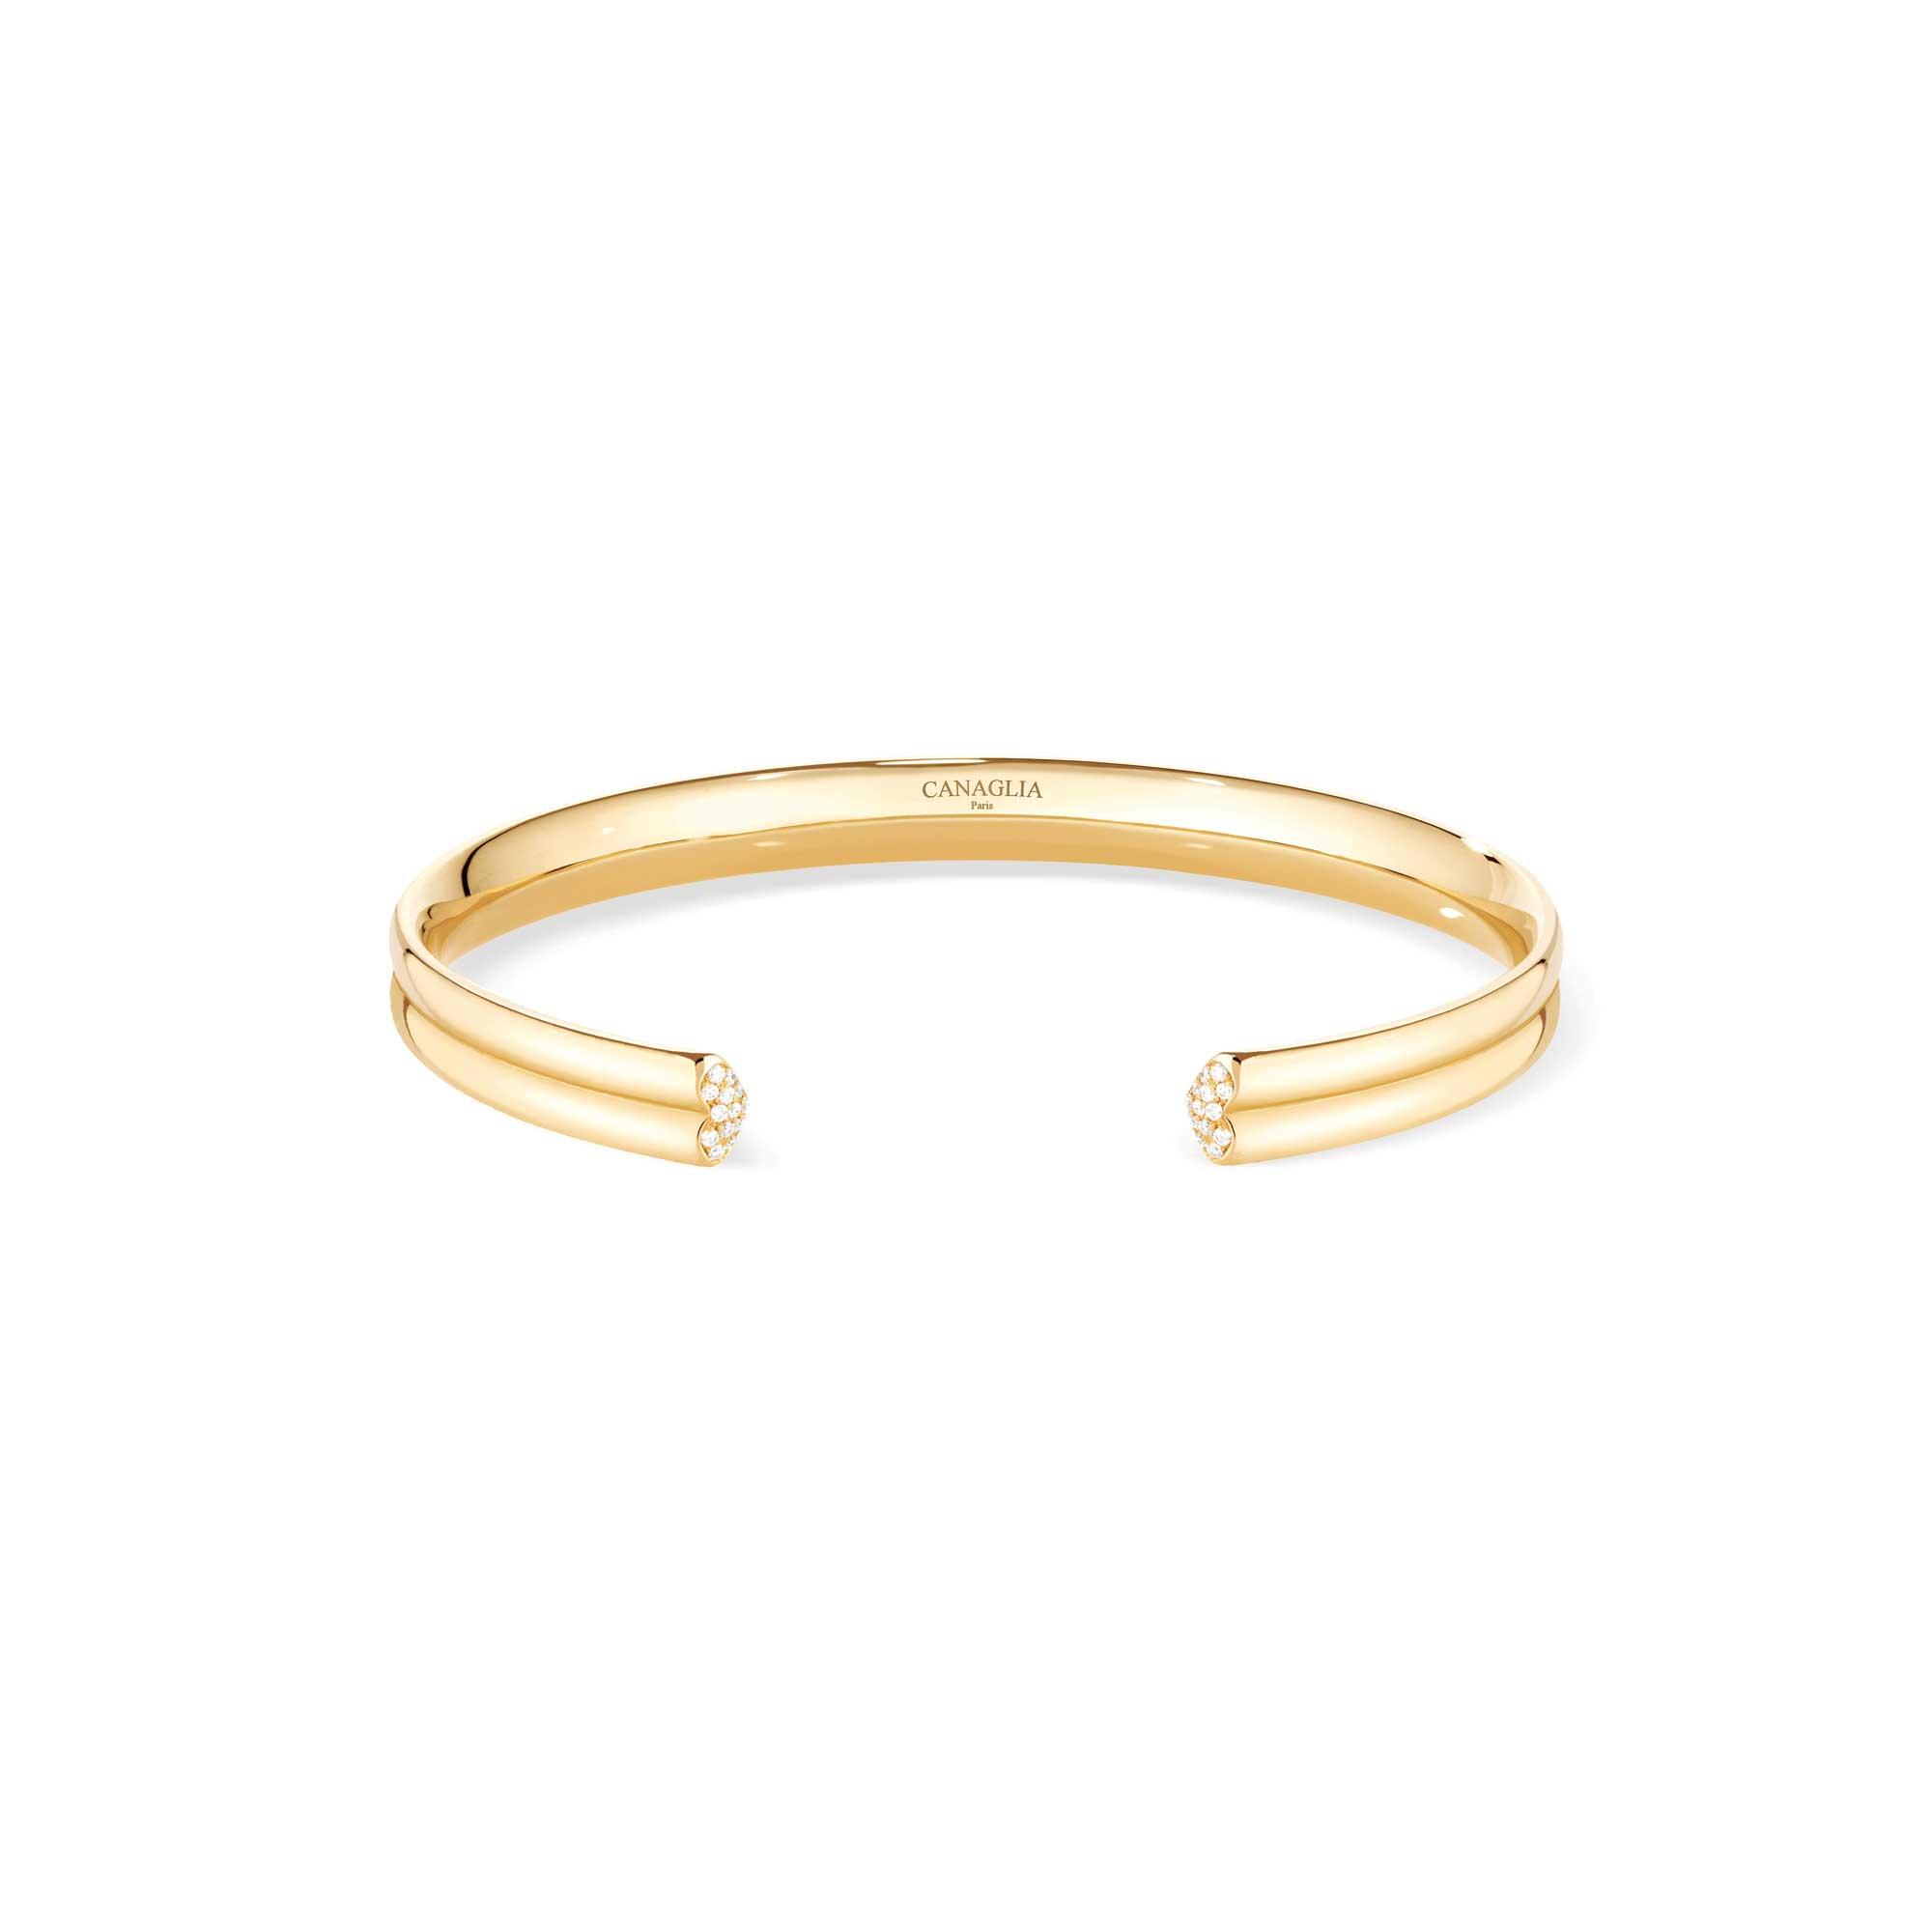 Bracelet coeur or jaune pavage diamants - Joaillerie Canaglia Paris-Milan